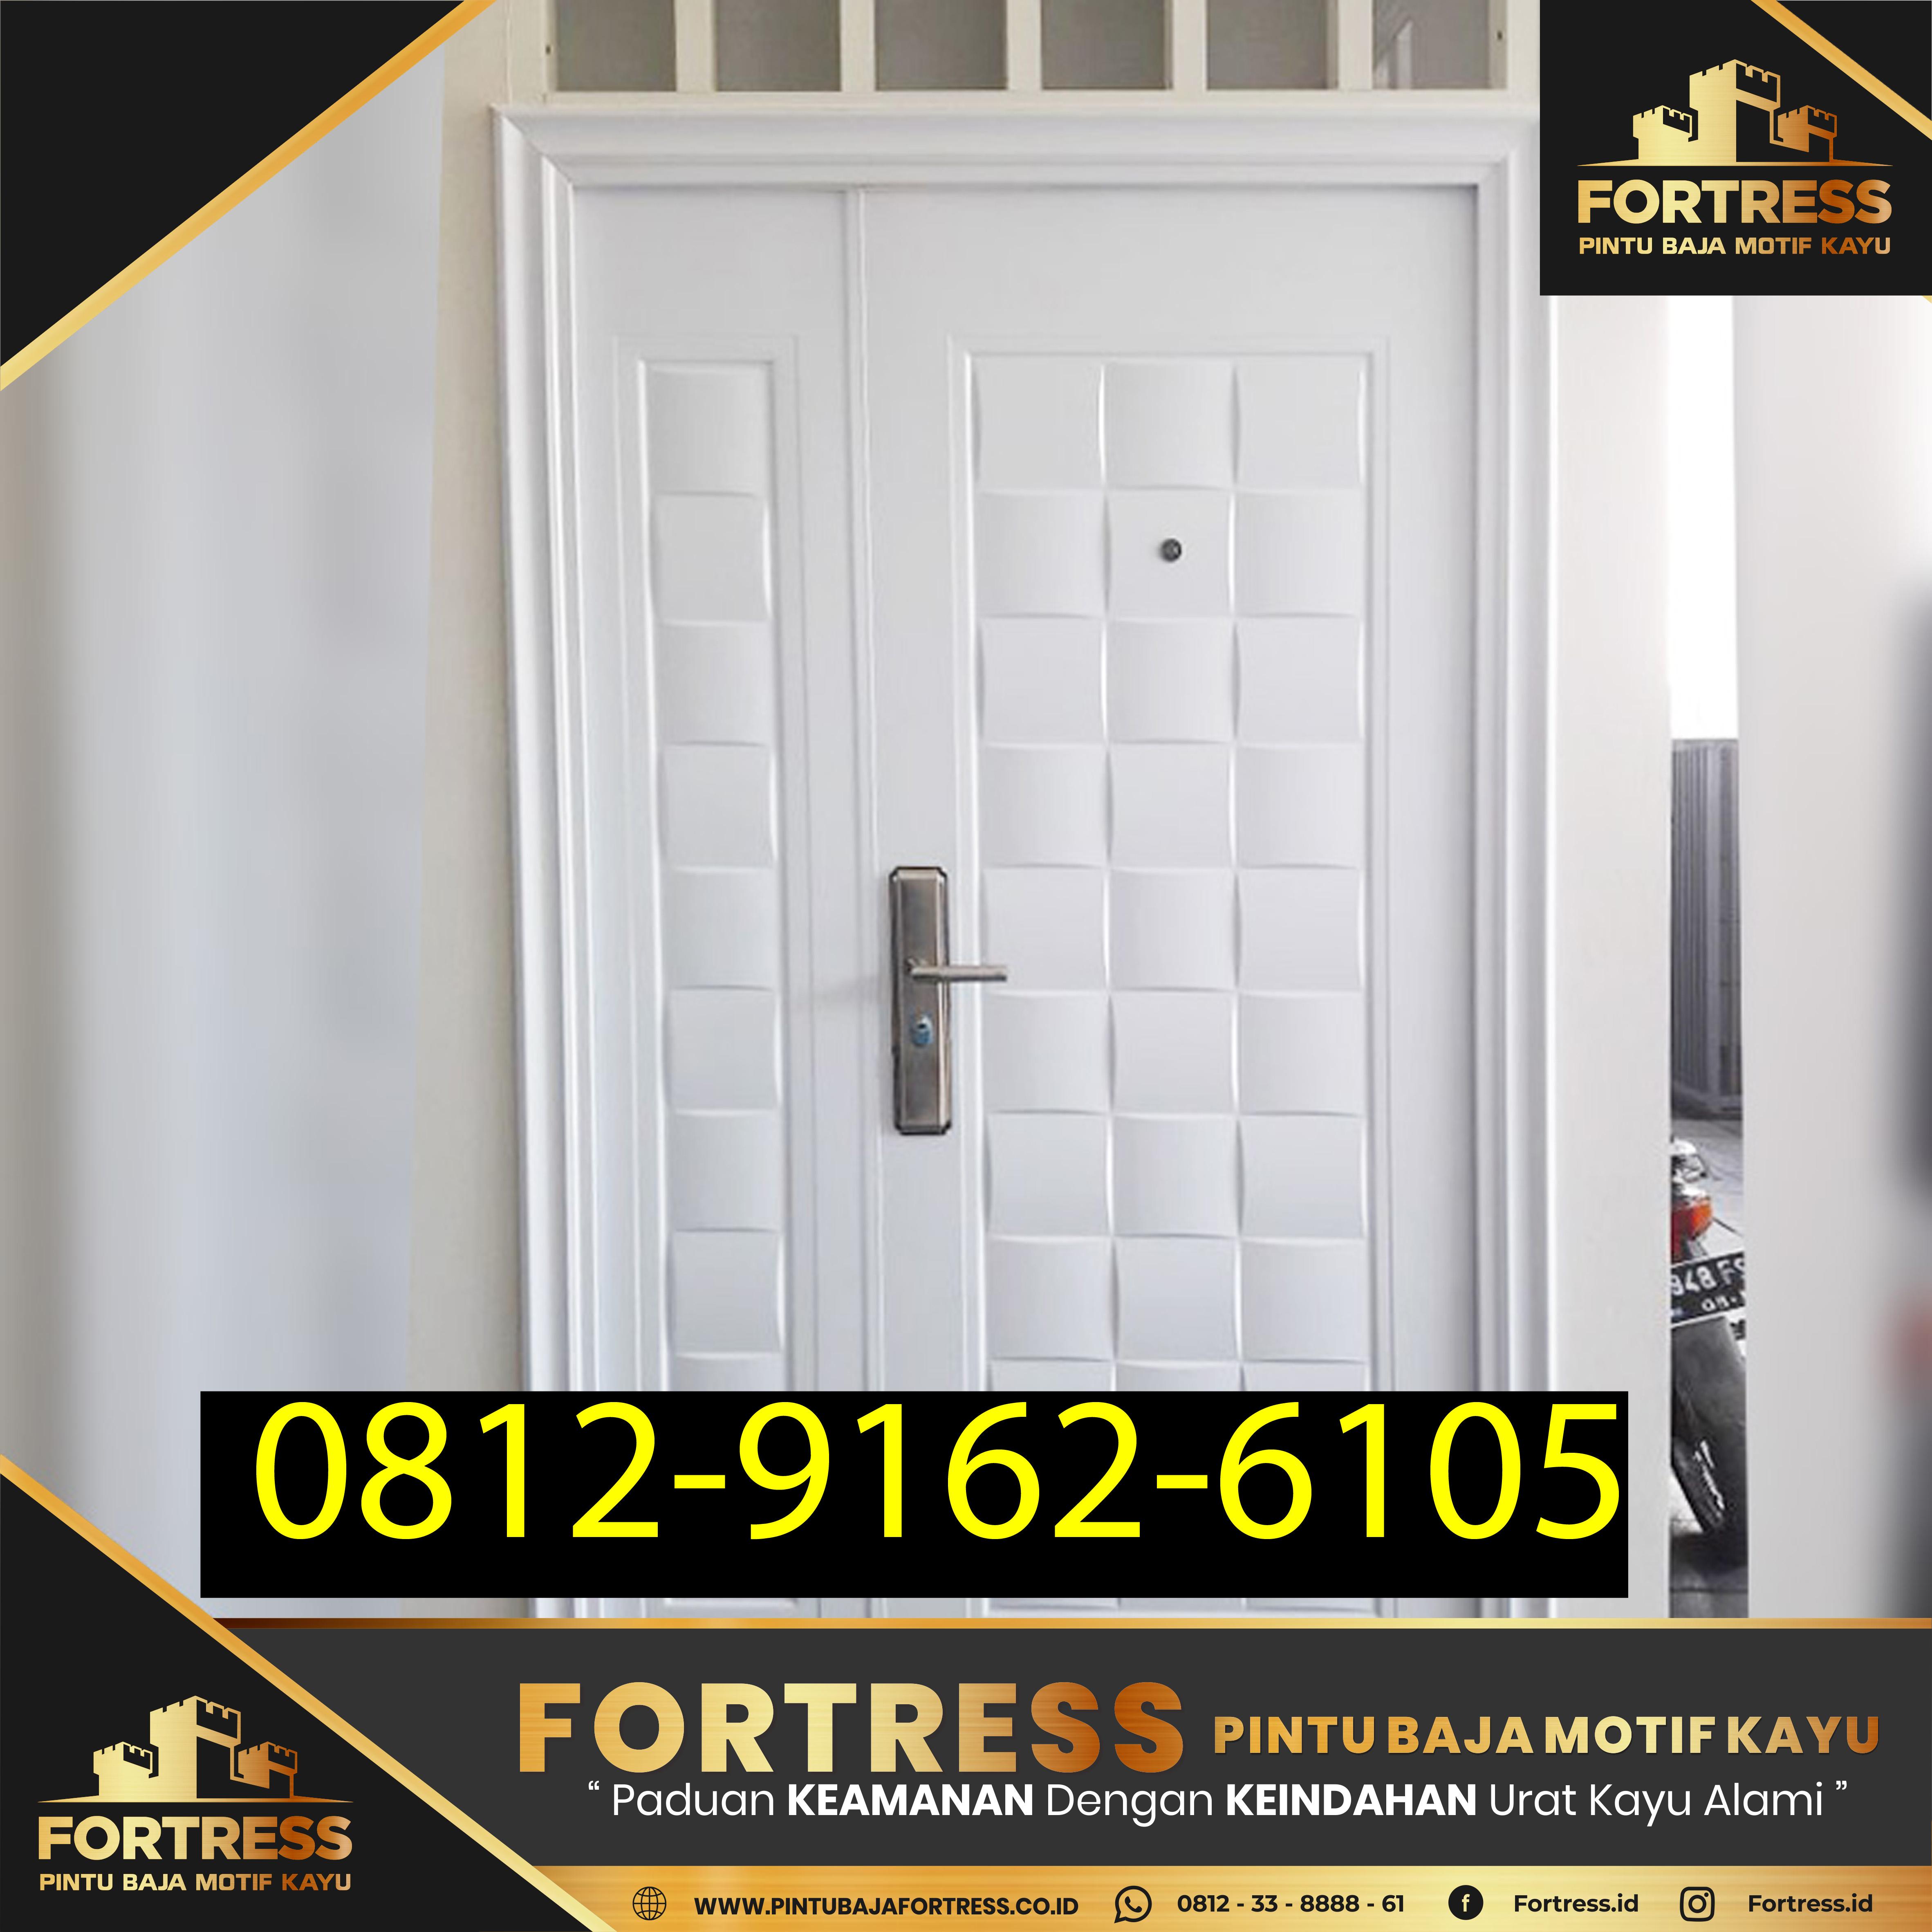 (FORTRESS 0812-9162-6108), Pintu Modern 2017 Gunungsitoli ...